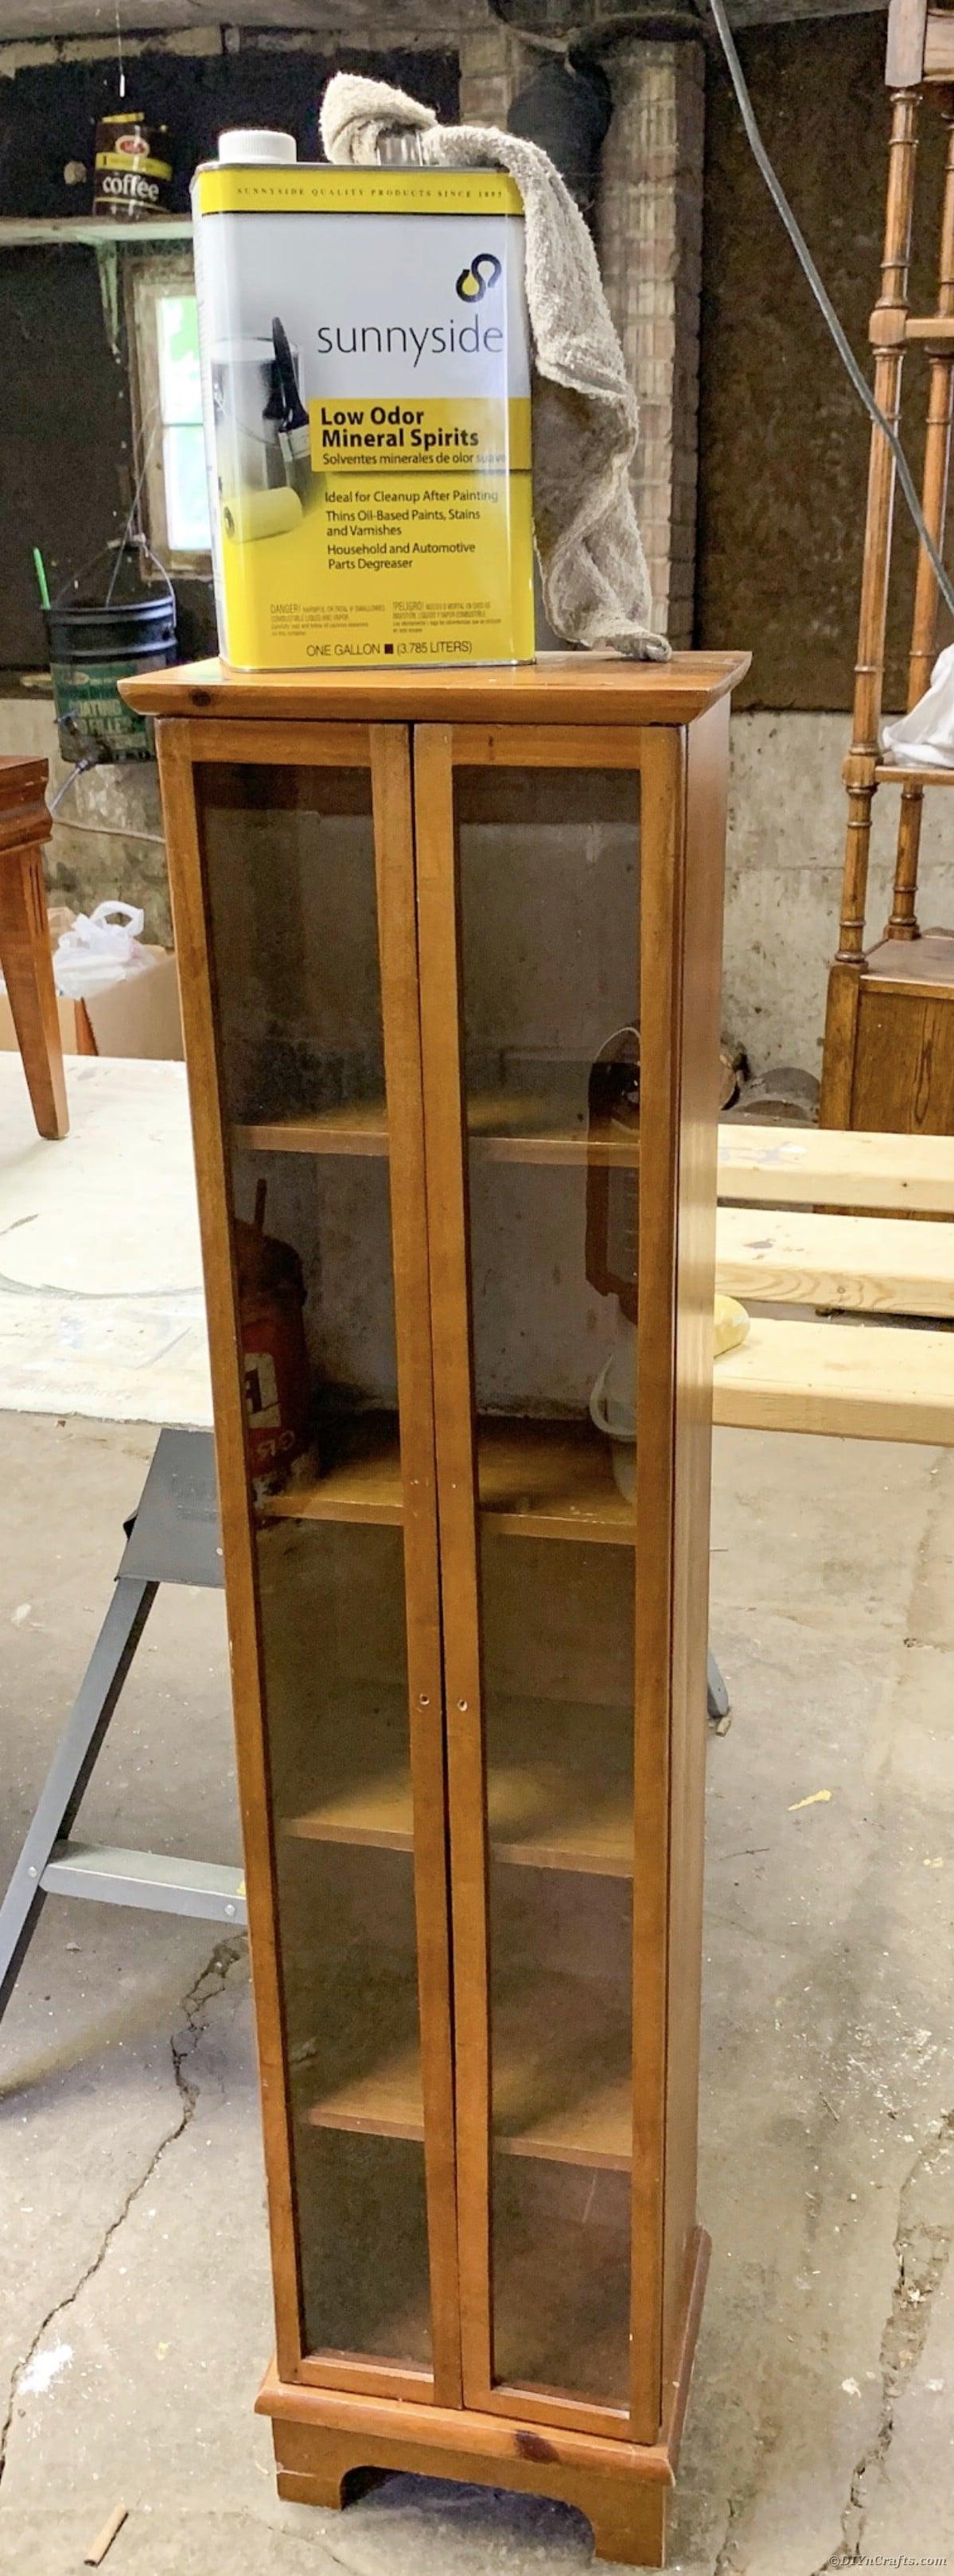 Curio cabinet before restoration